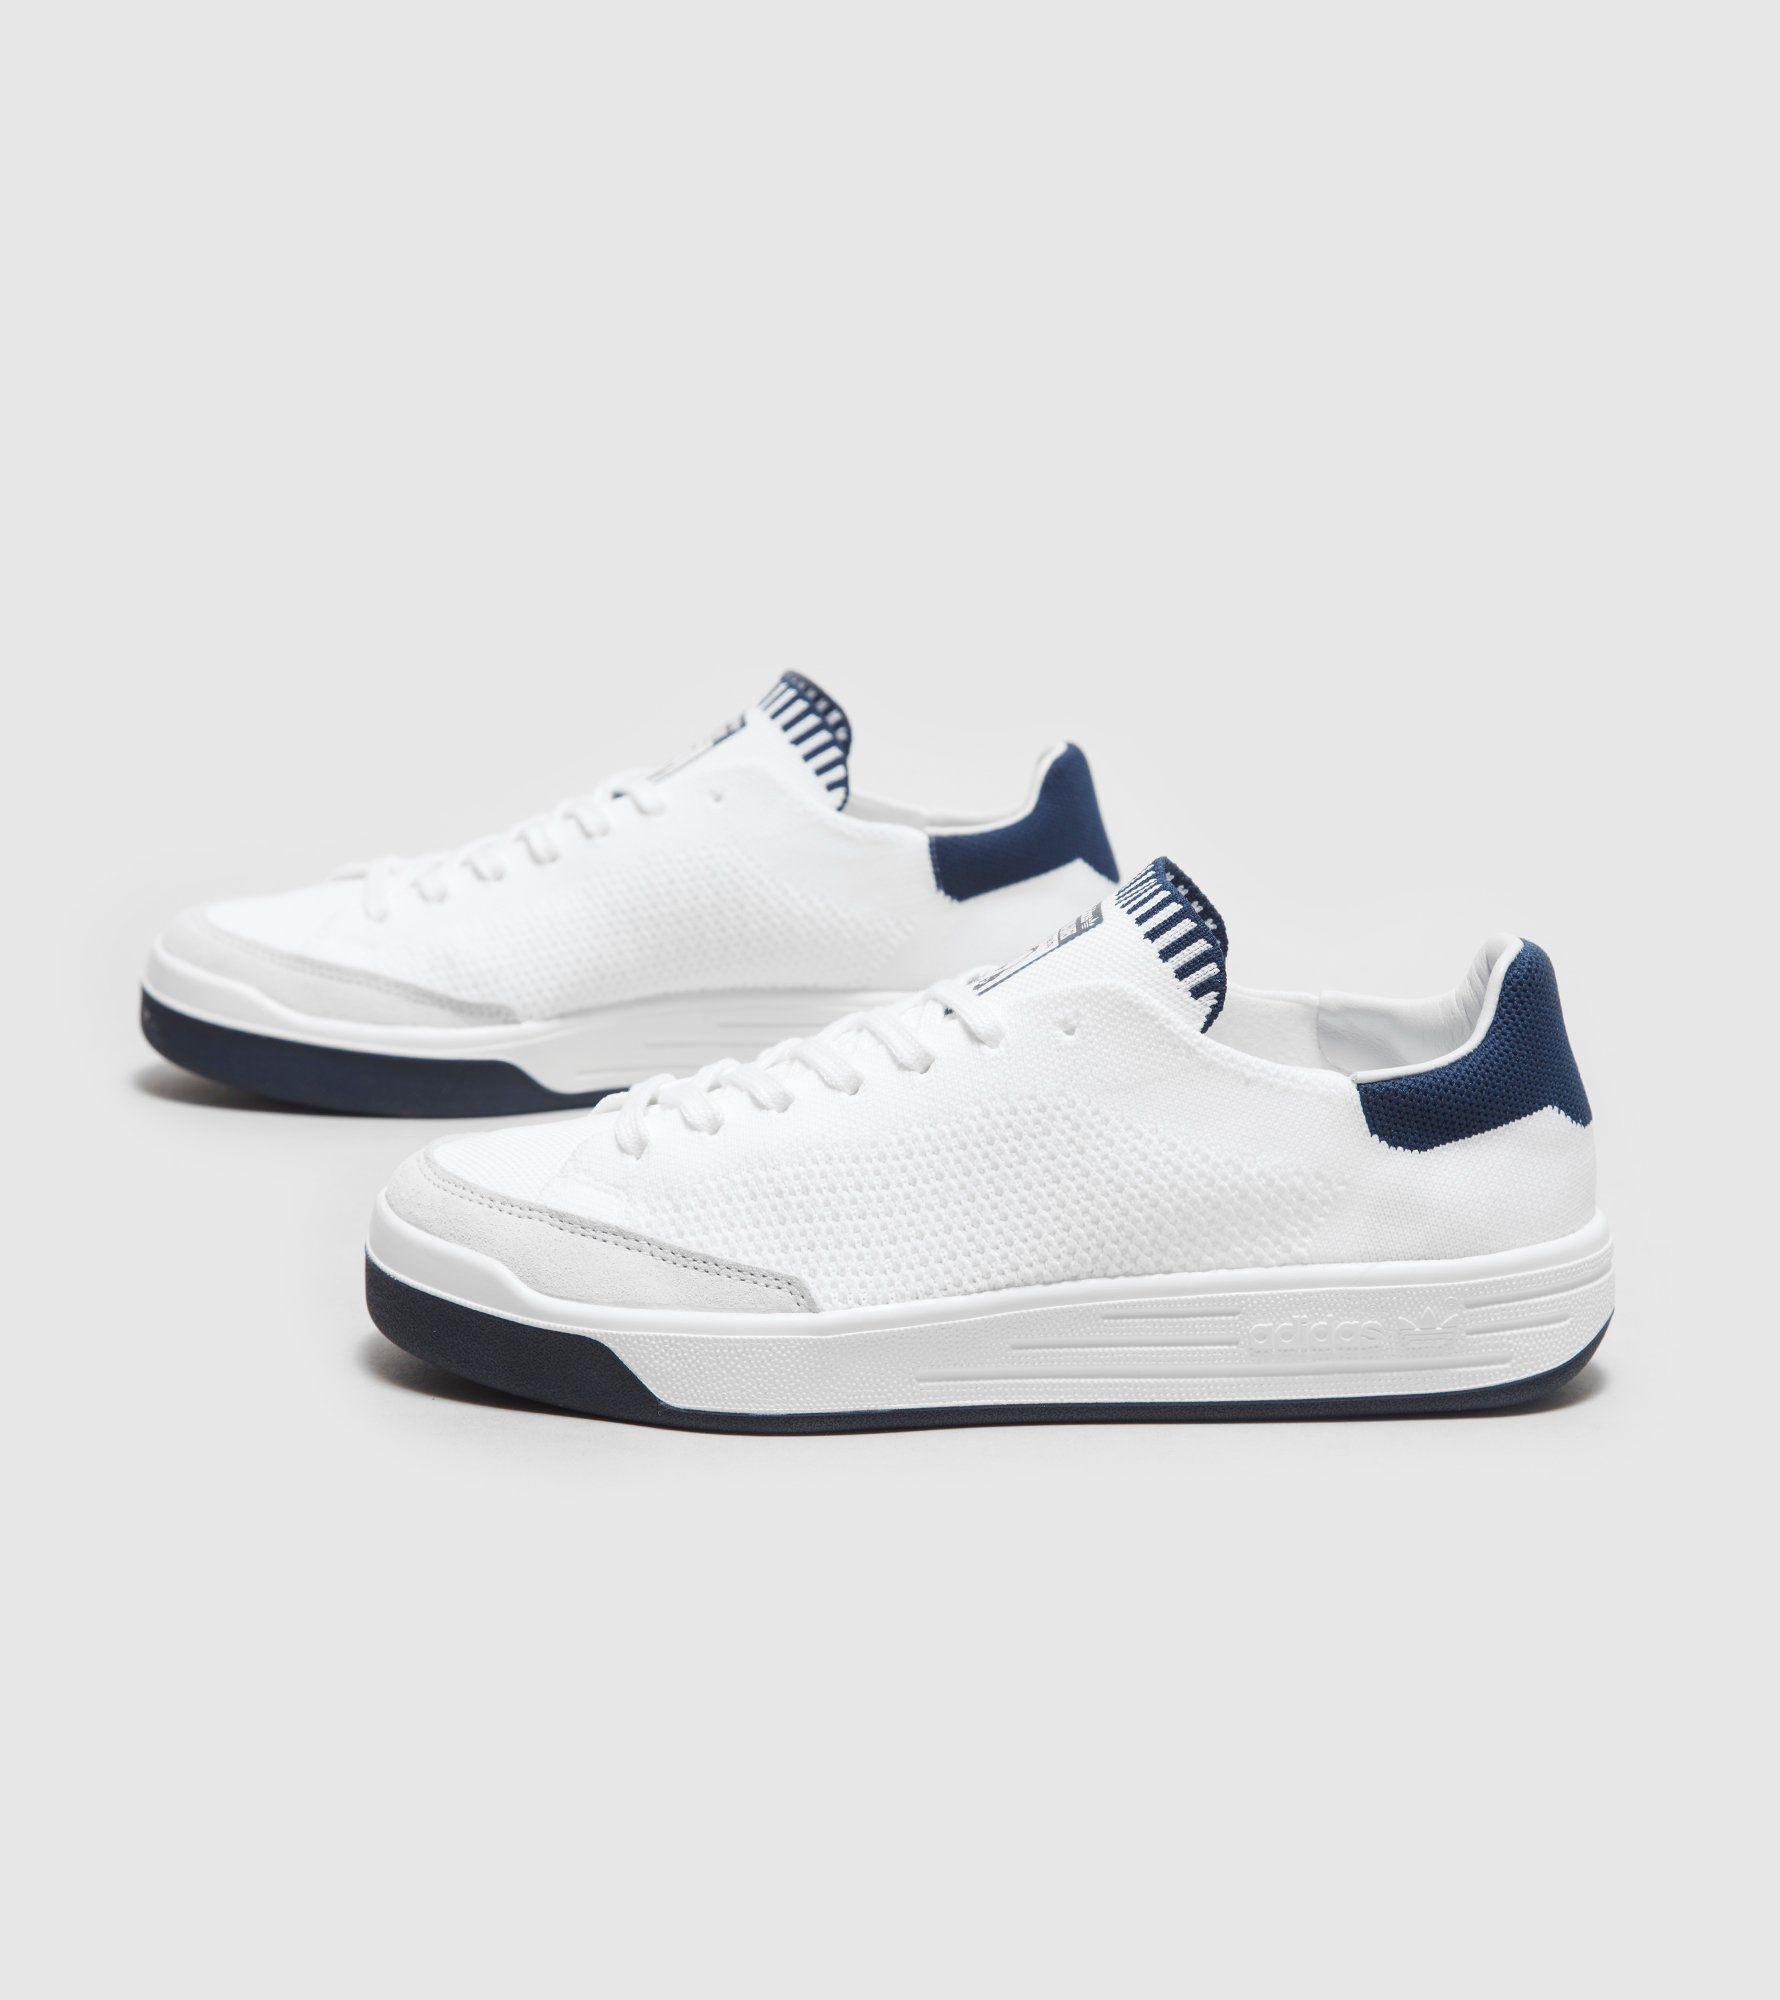 ¿Adidas Originals Rod Laver primeknit tamaño?